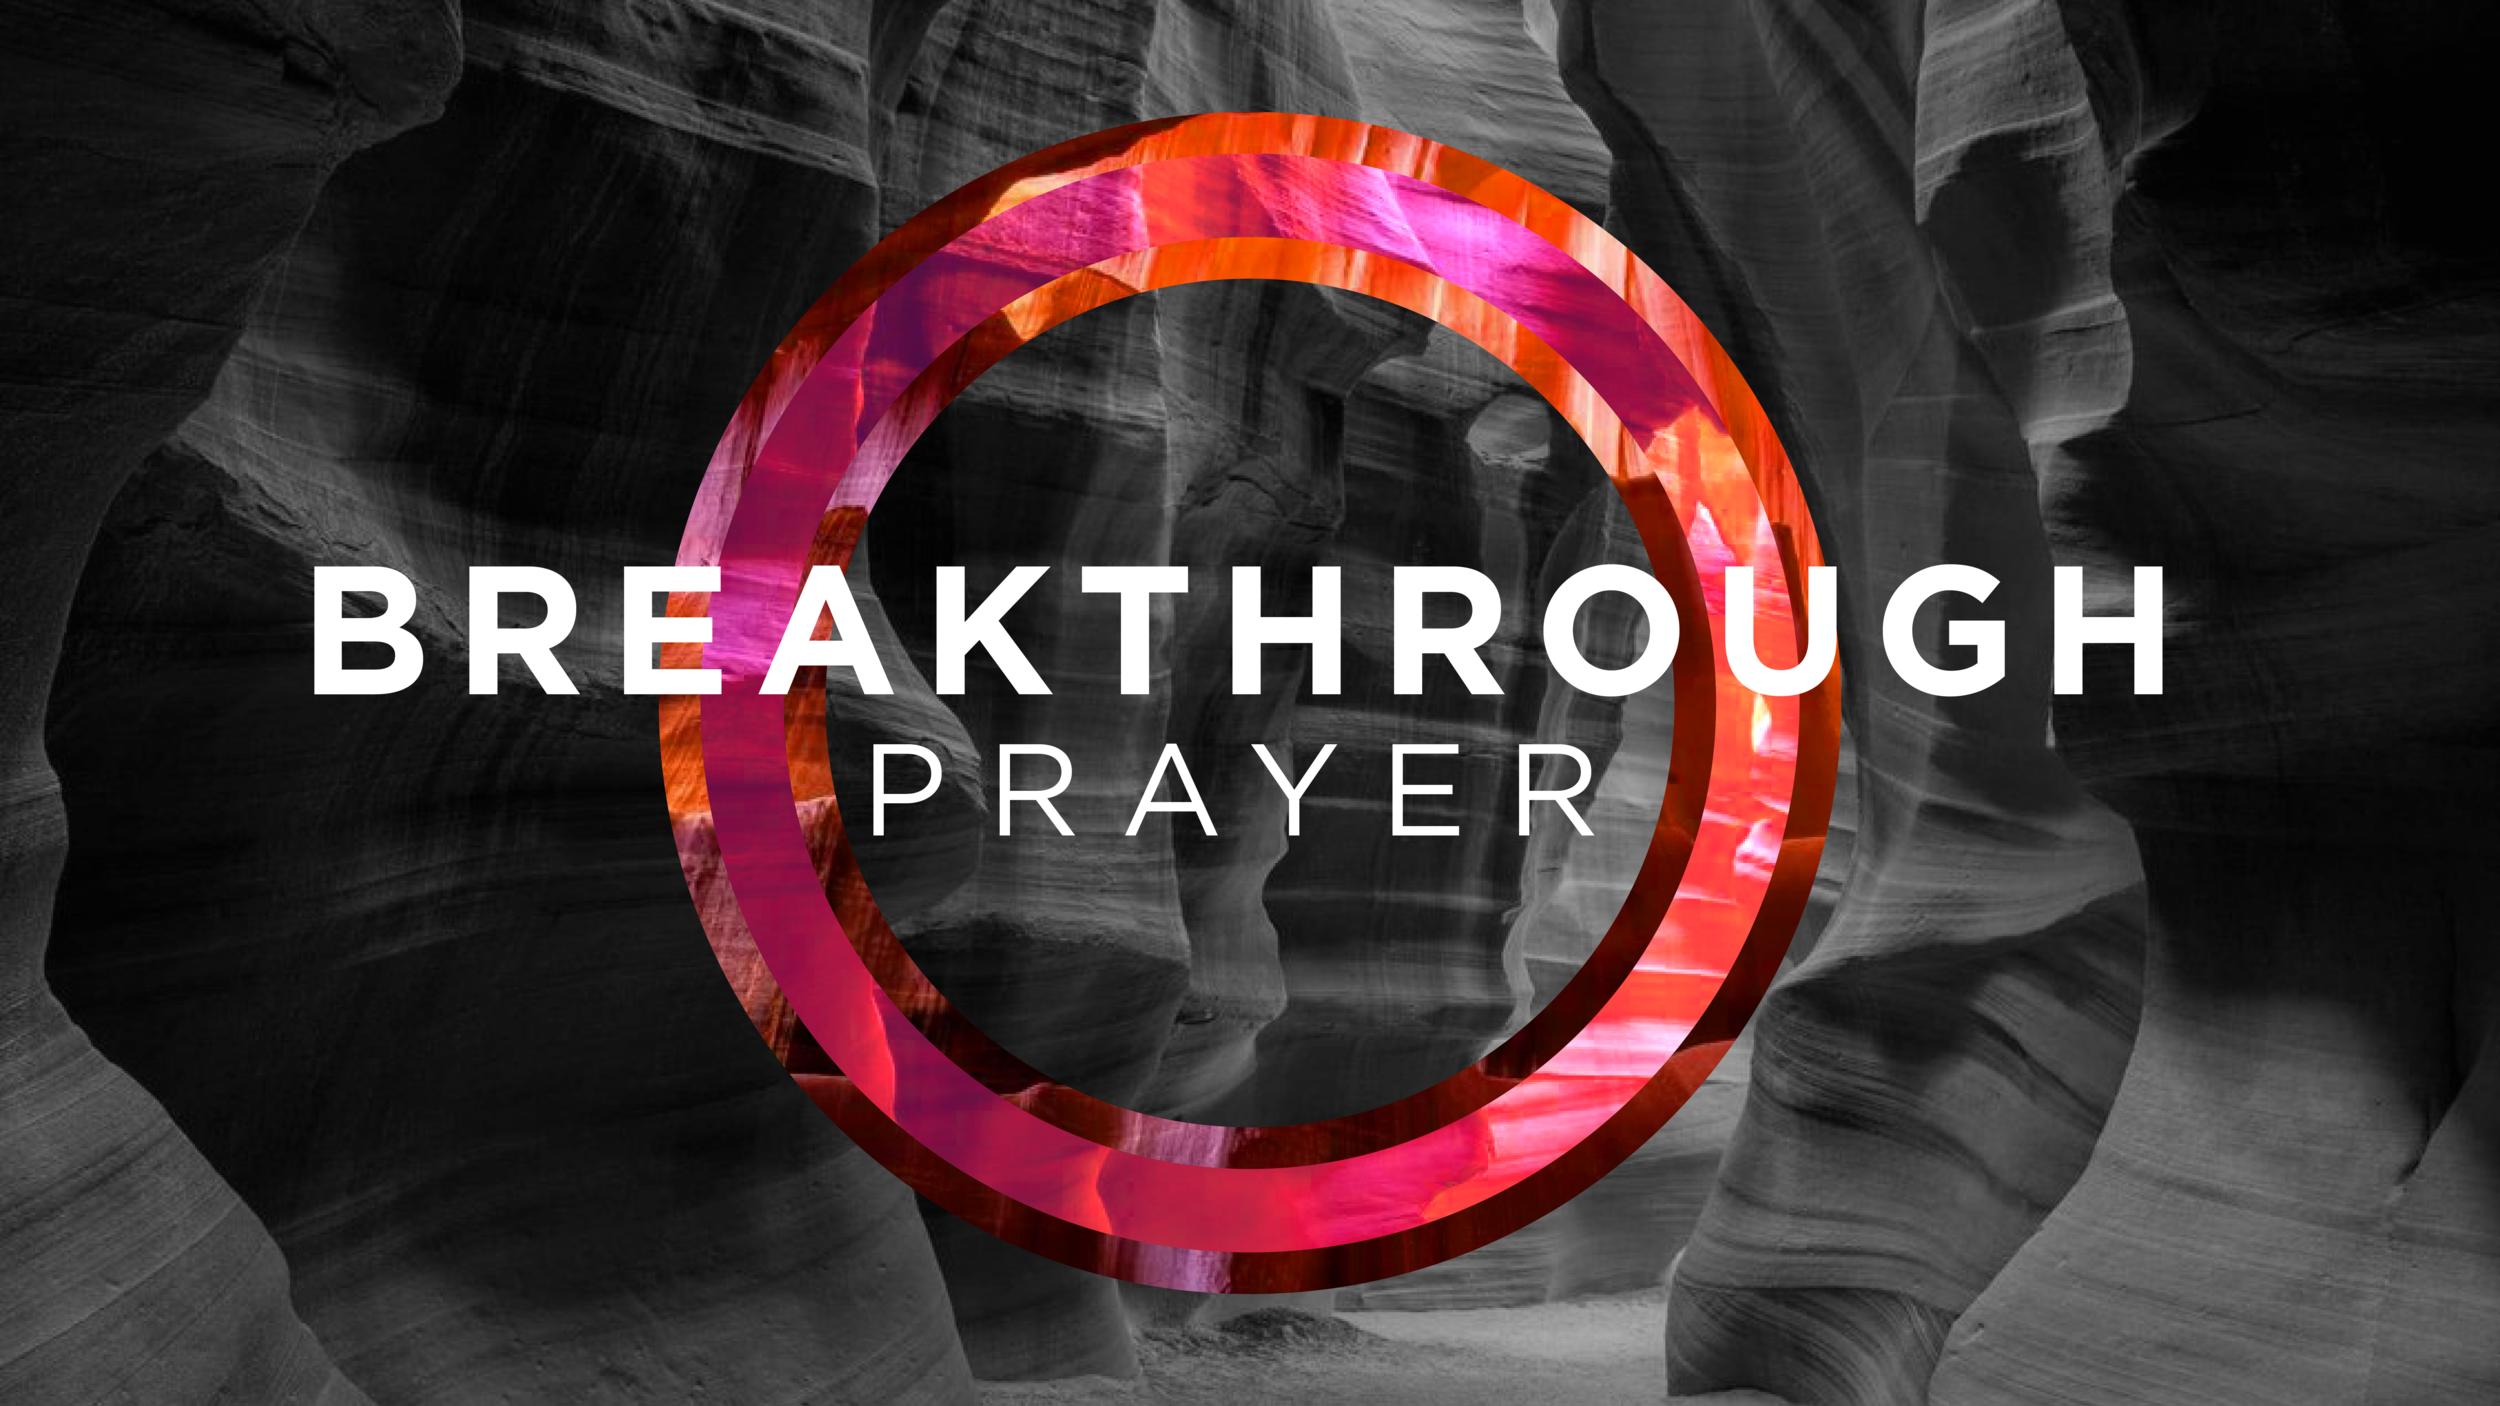 BreakthroughPrayer-01.png